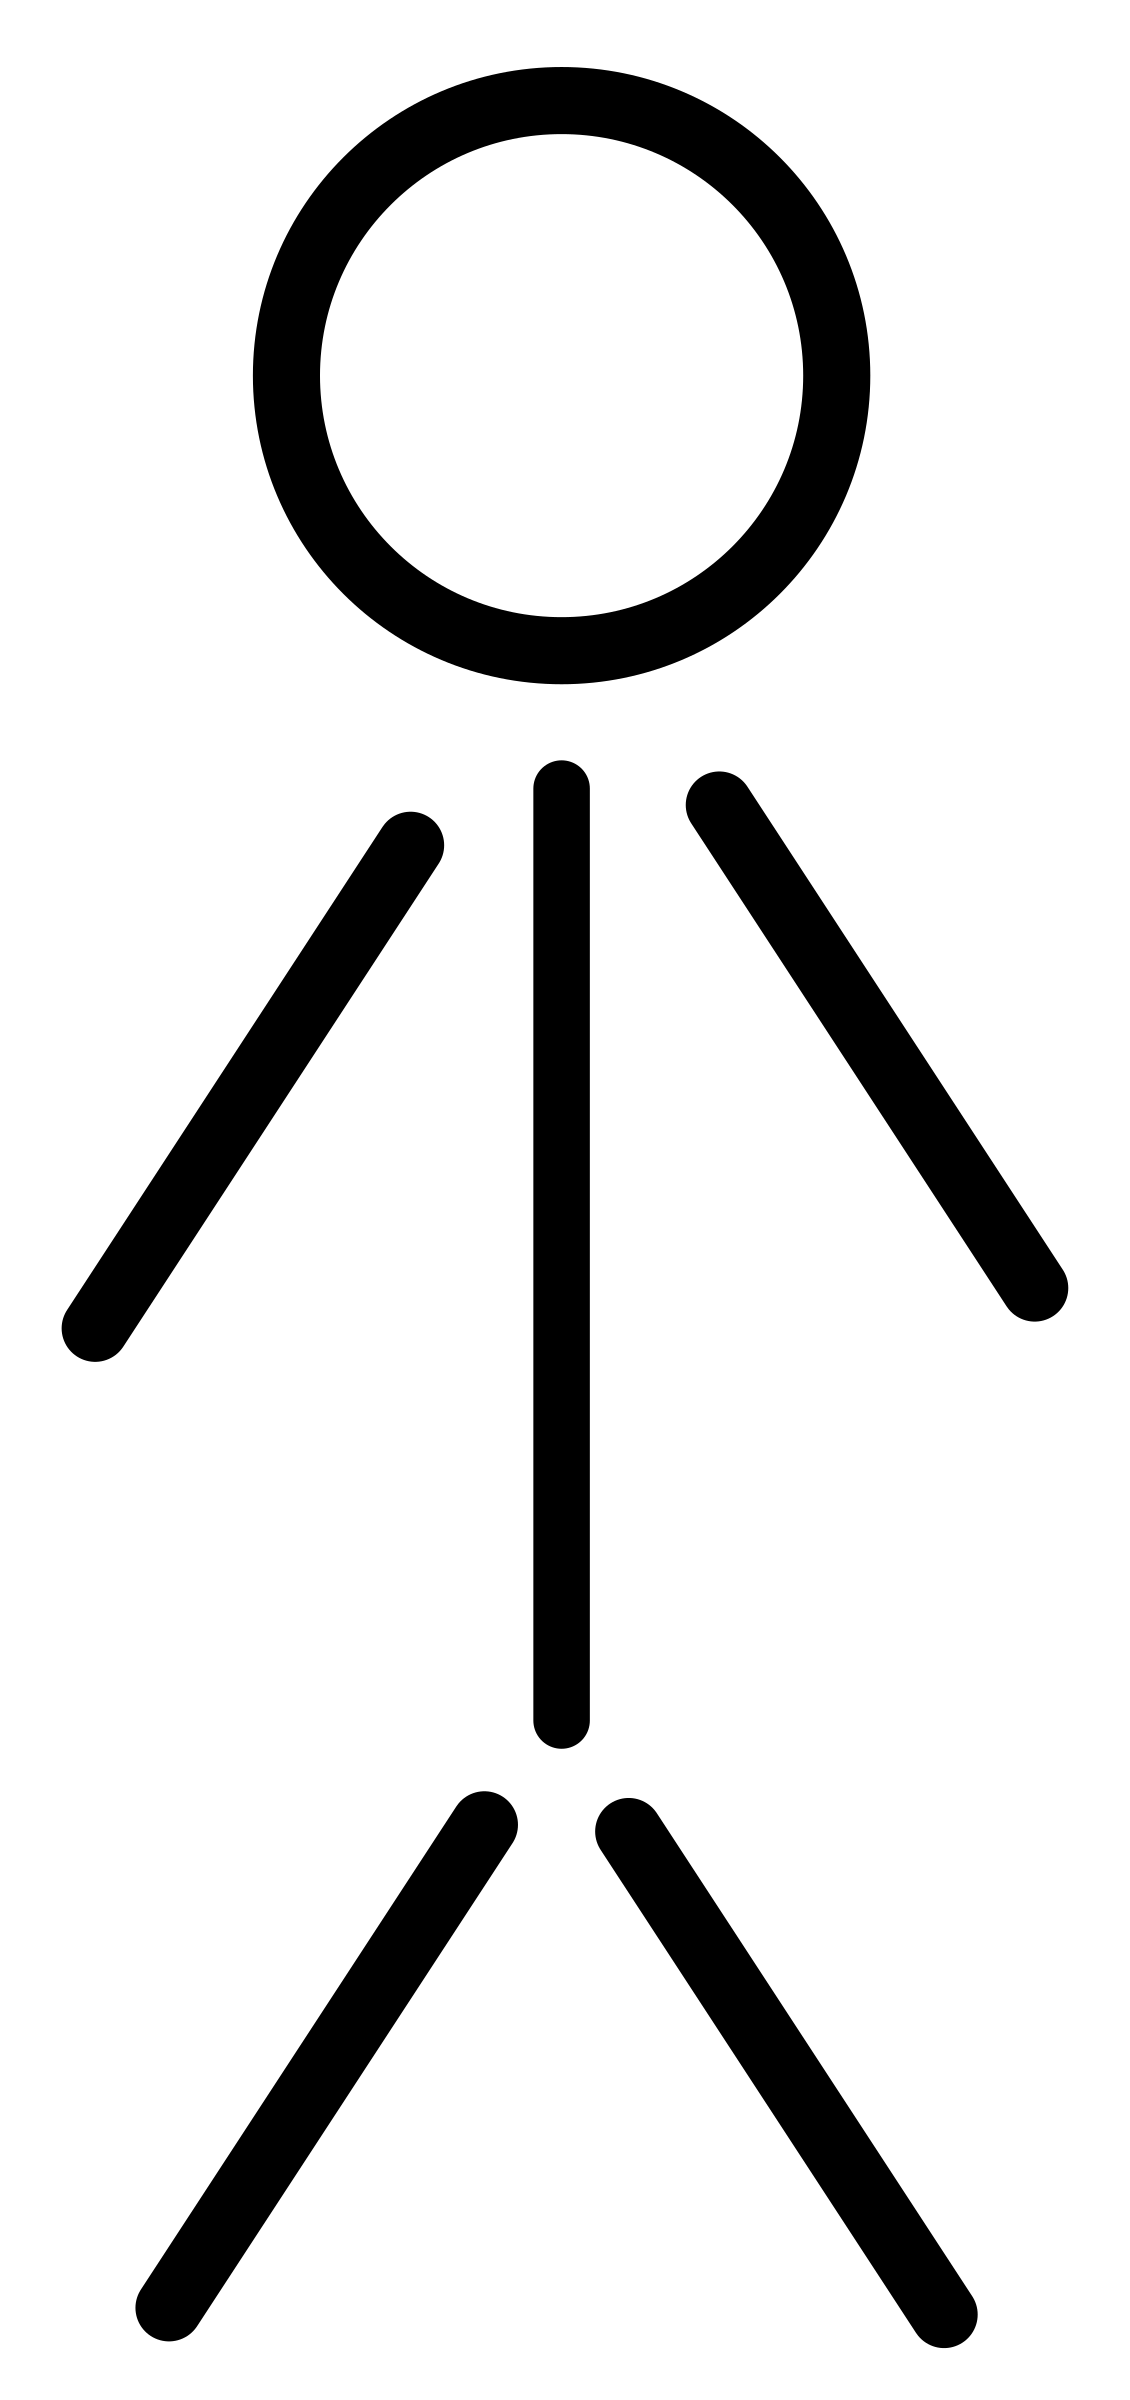 Simple Stick Figure transparent PNG.